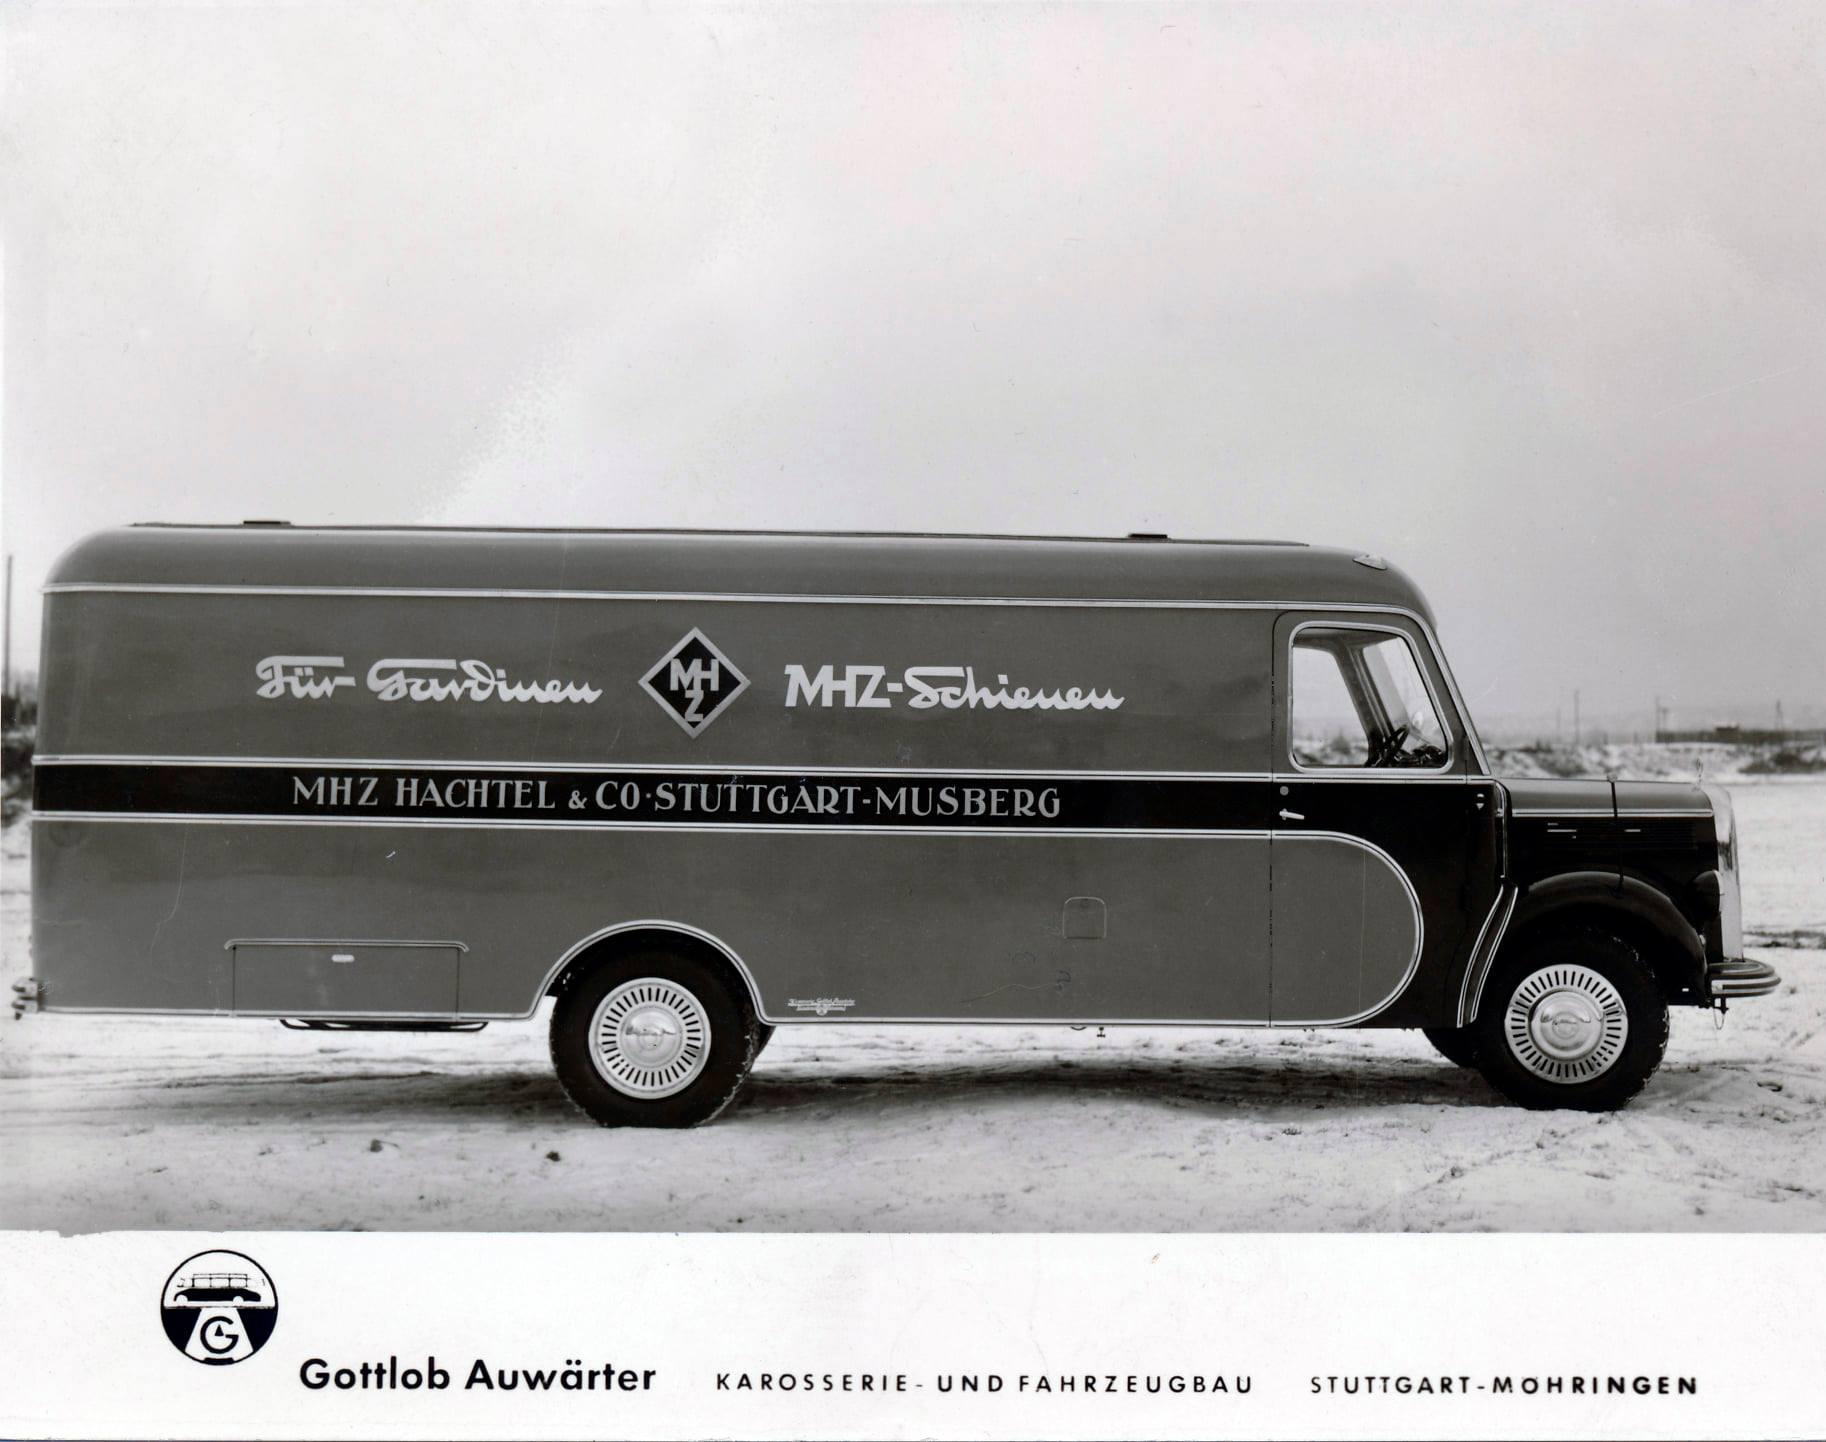 MB-L35-311-312-Kasten-wagen